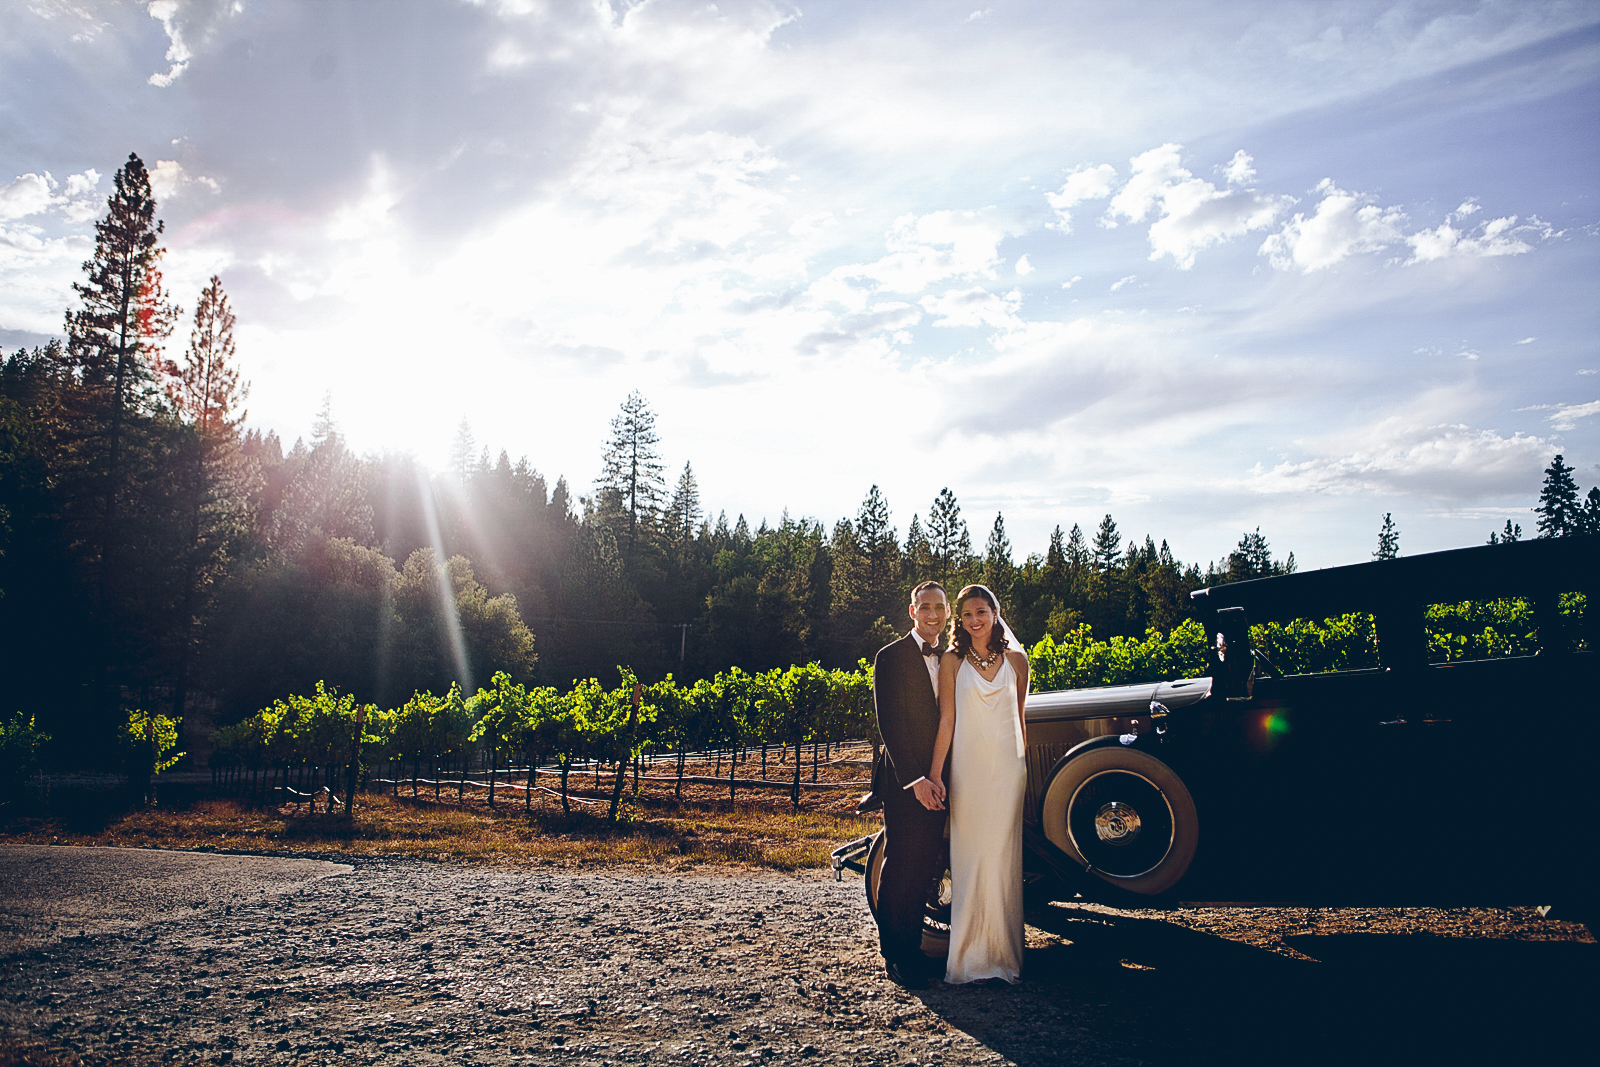 miraflores_winery_wedding_photography_ian_melissa_ebony_siovhan_bokeh_photography_46.jpg